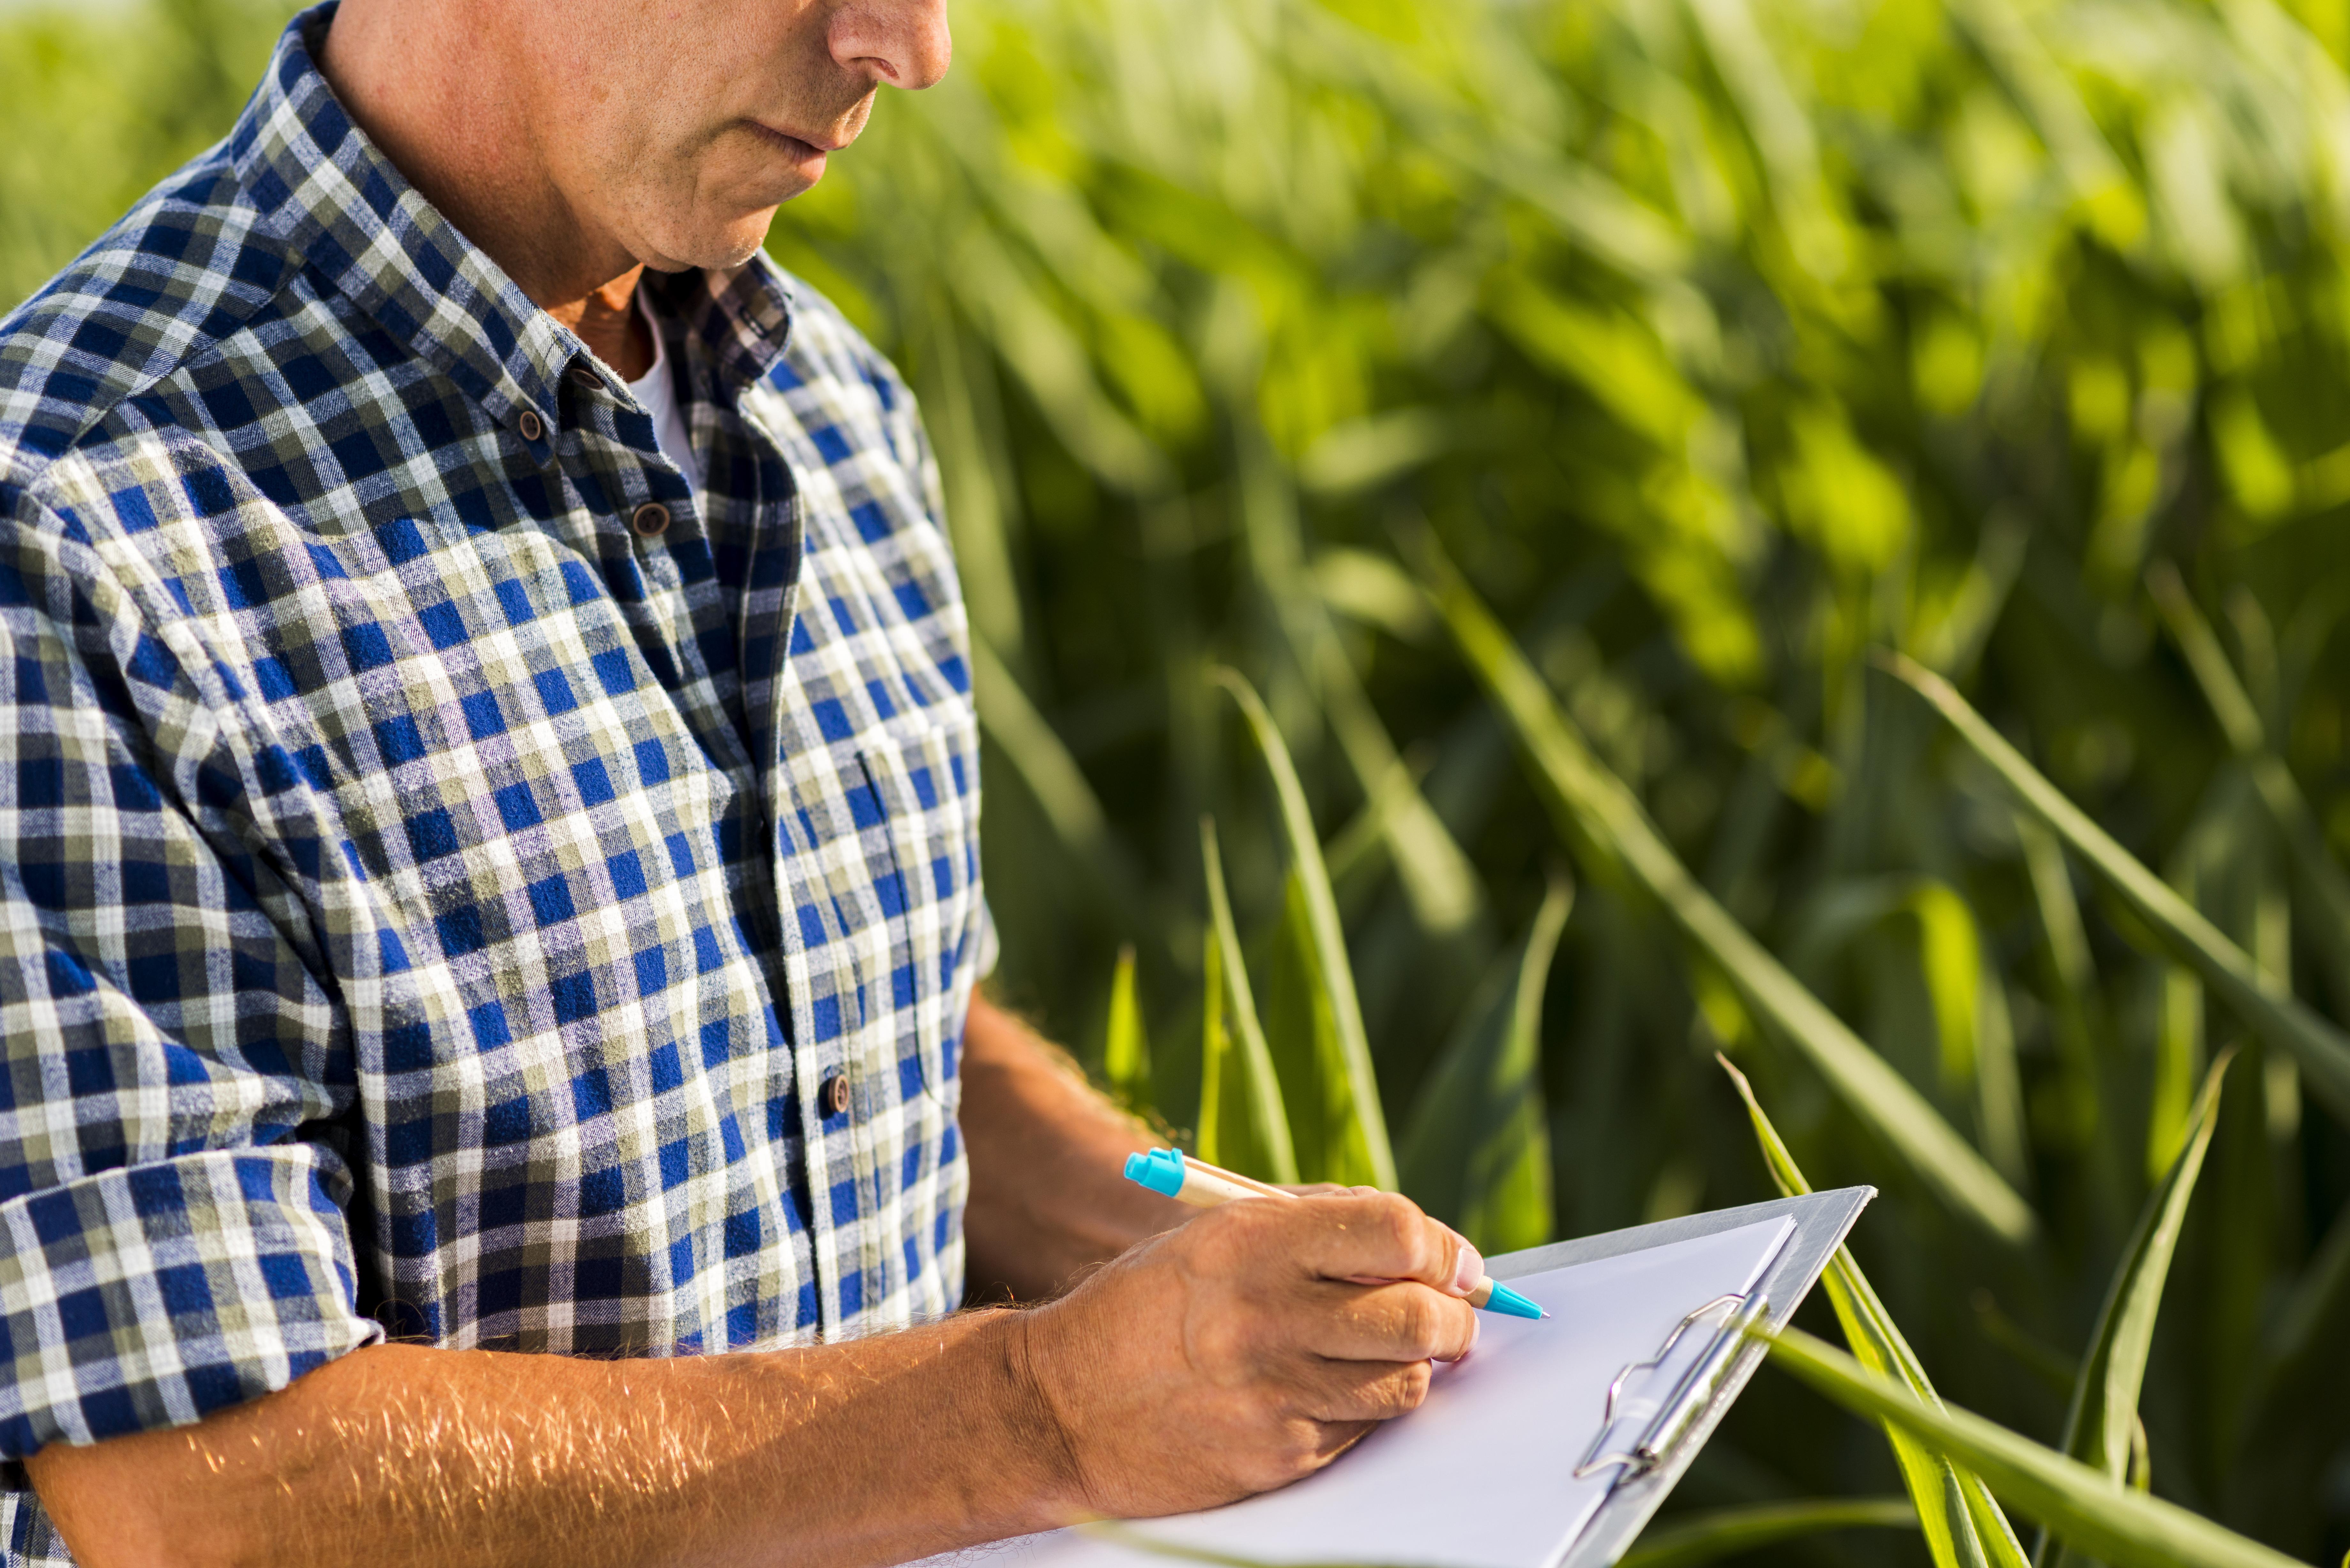 ayudas agrícolas Canarias 2020